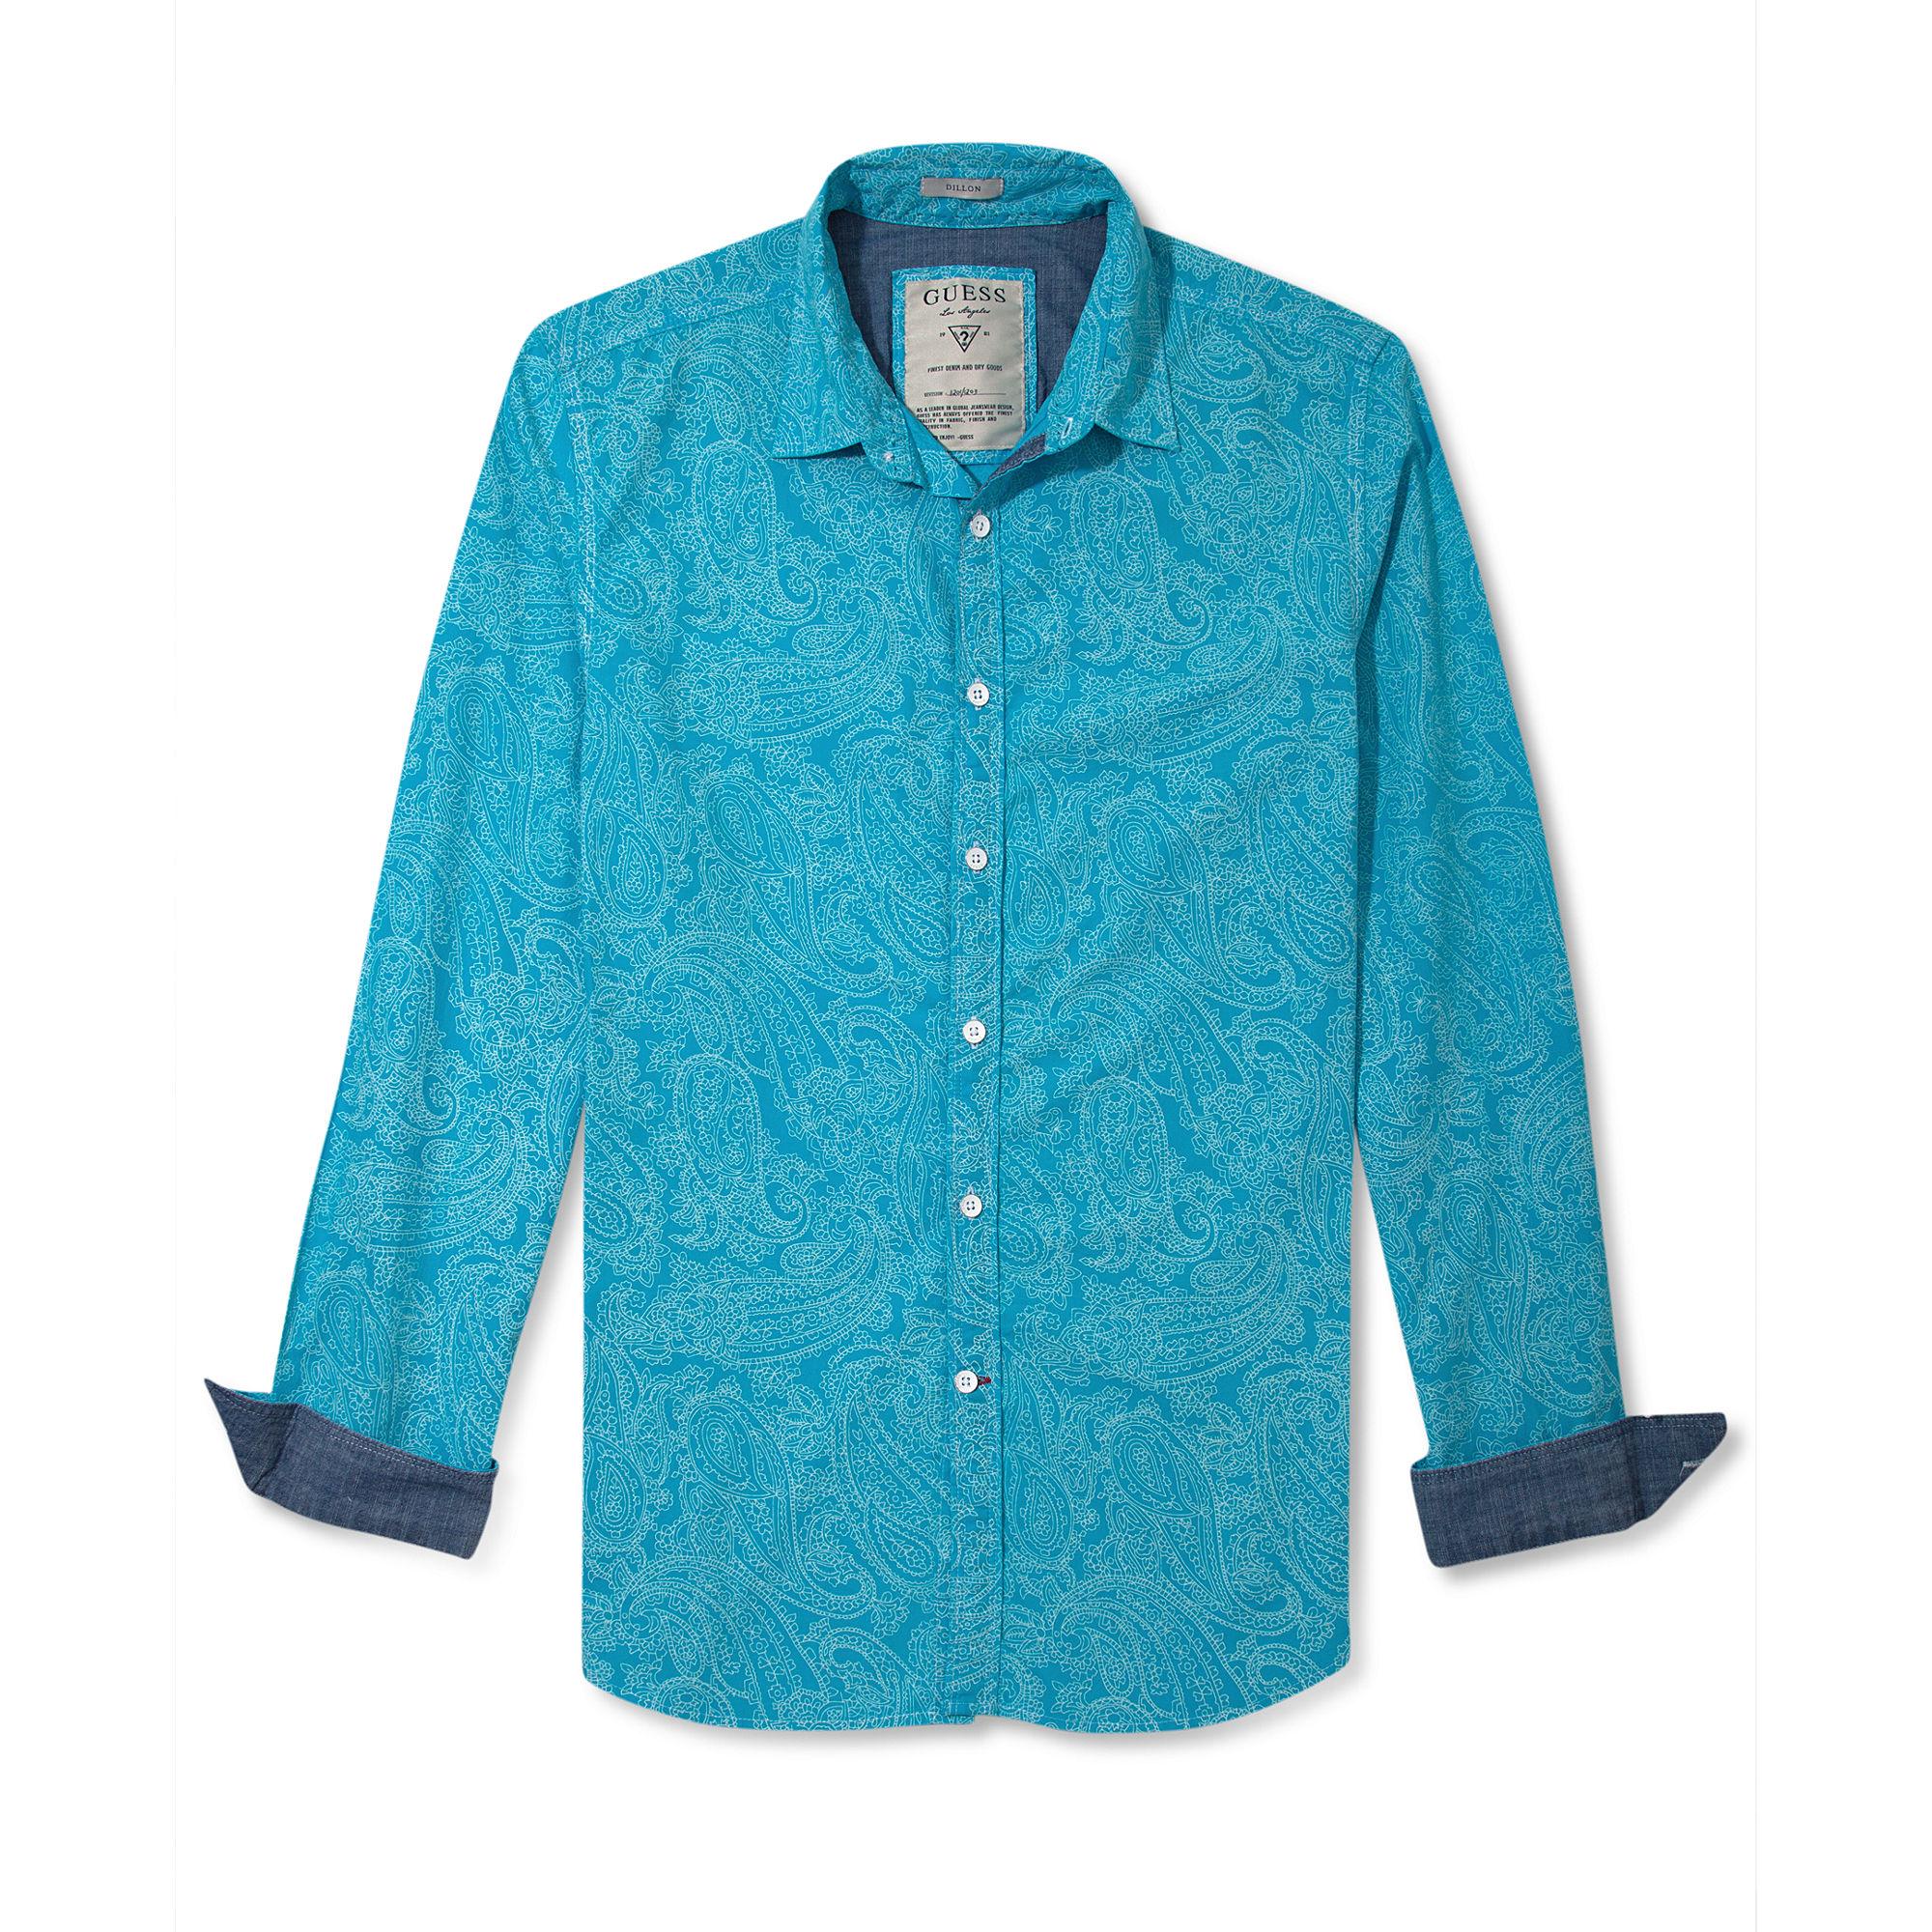 Lyst Guess Jeans Shirt Long Sleeve Dillon Goa Printed